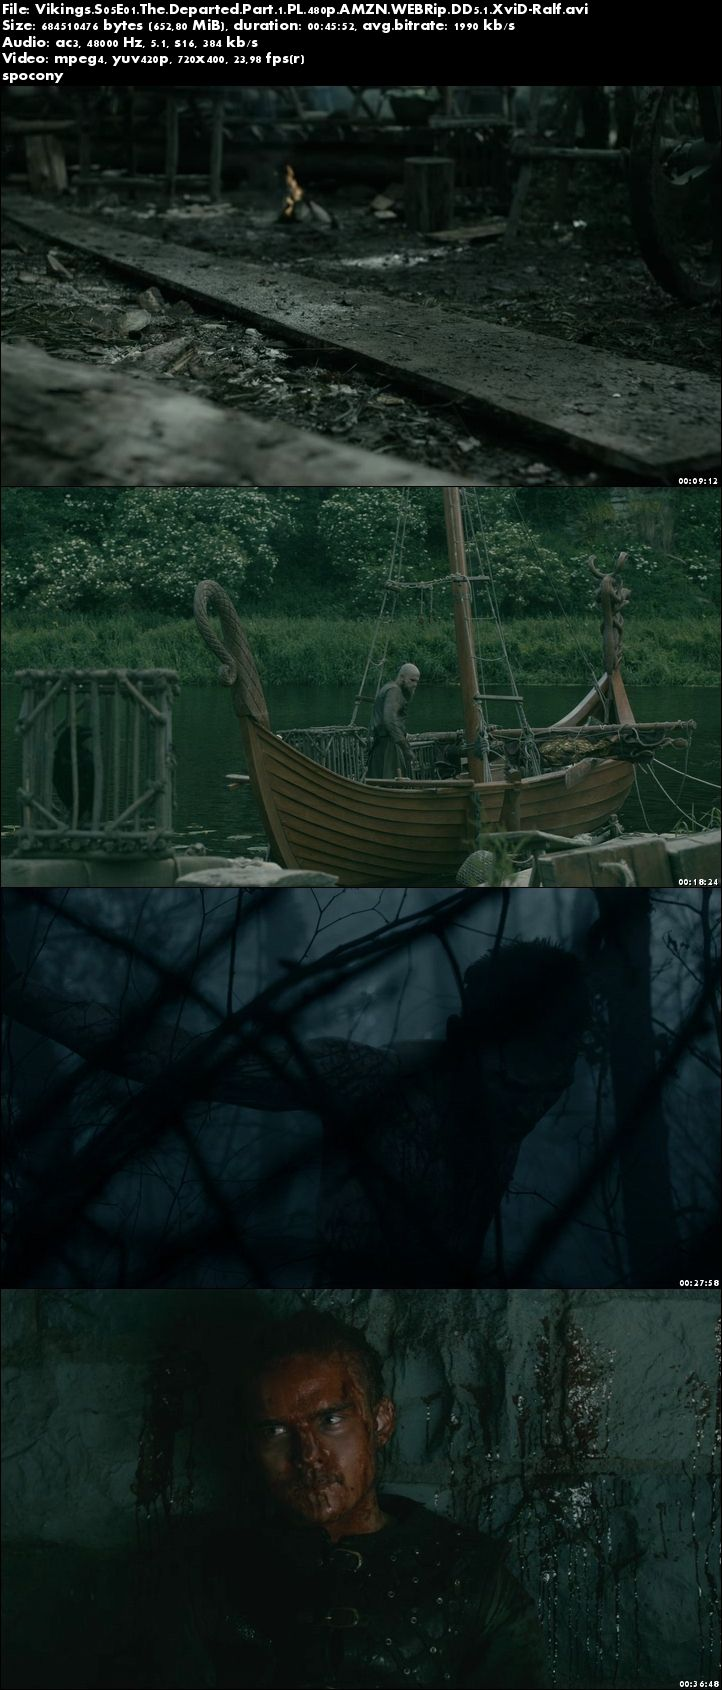 Wikingowie / Vikings (2017) {Sezon 5} (Odcinki 01 do 10) WEB/HDTV.PL.480p.XviD-Ralf [Lektor PL]